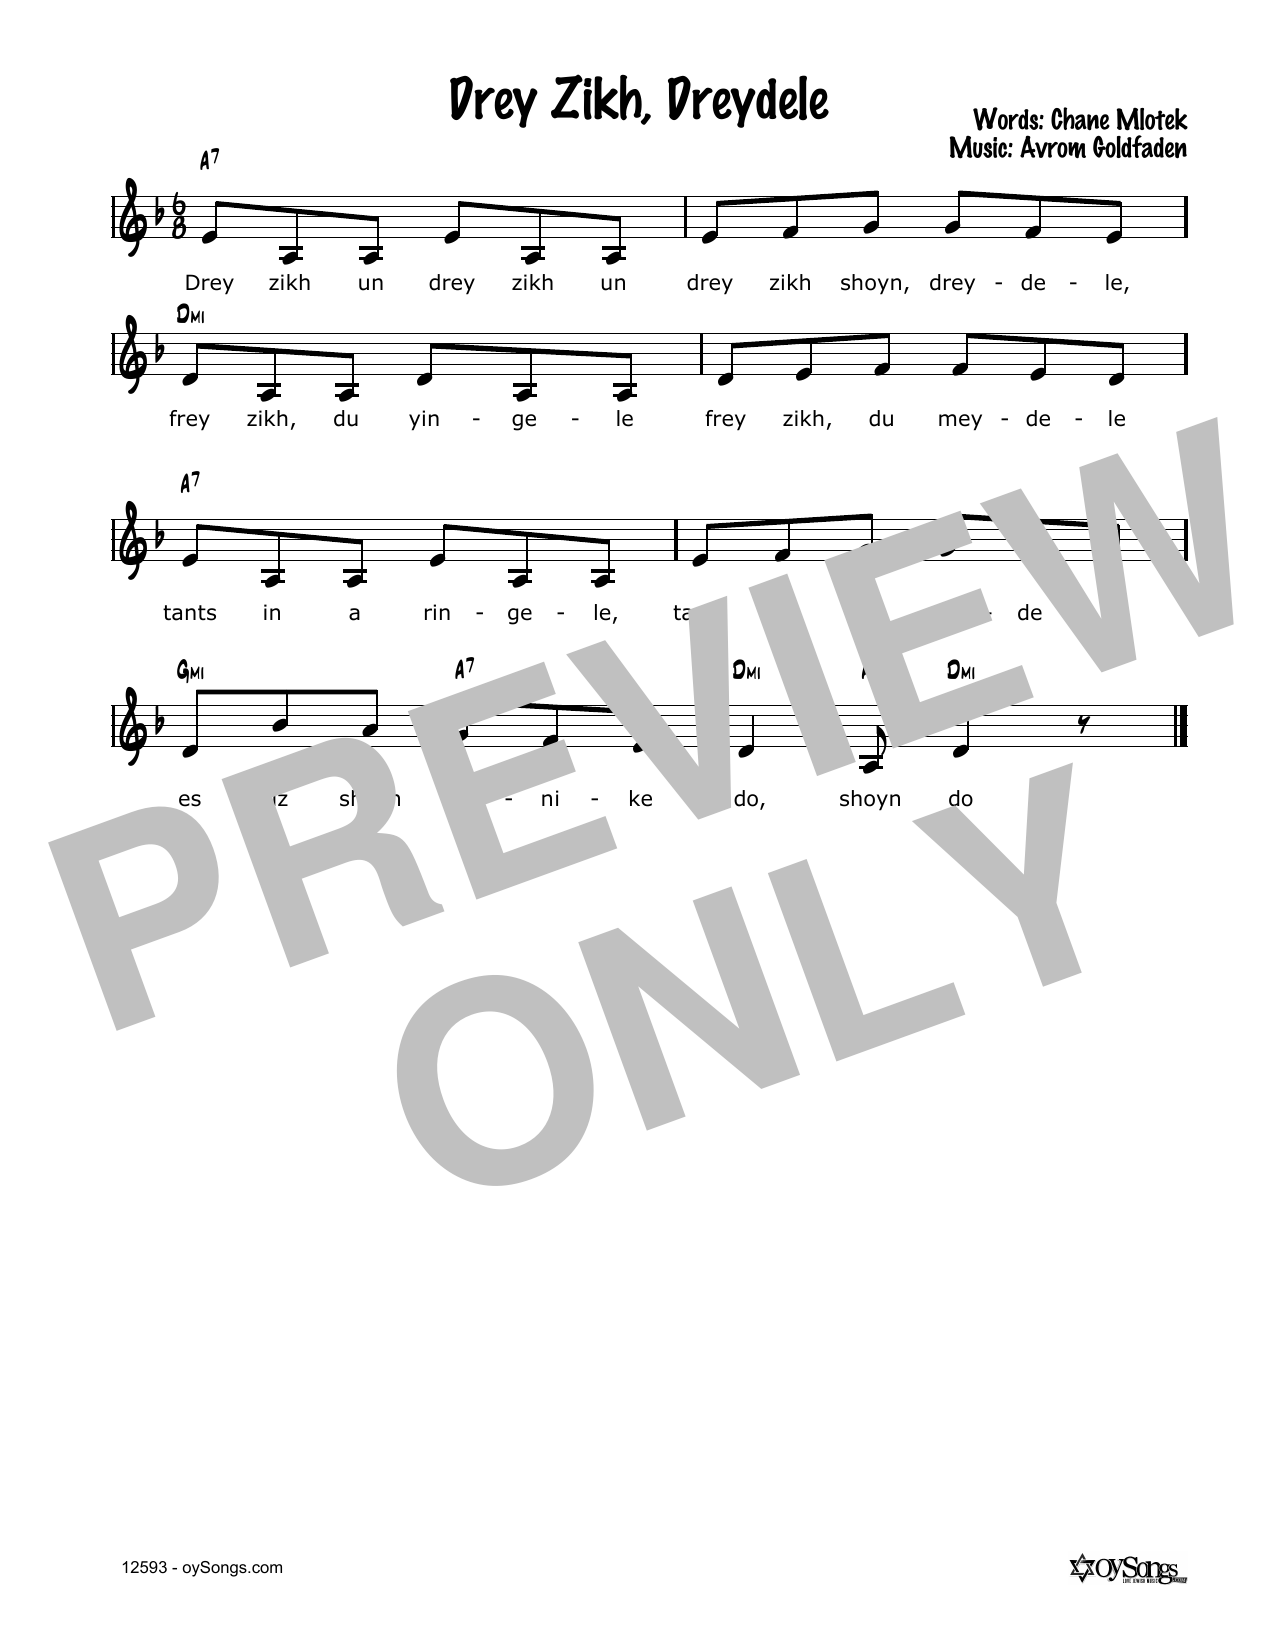 Avrom Goldfaden Drei Zich, Dreidele sheet music notes and chords. Download Printable PDF.